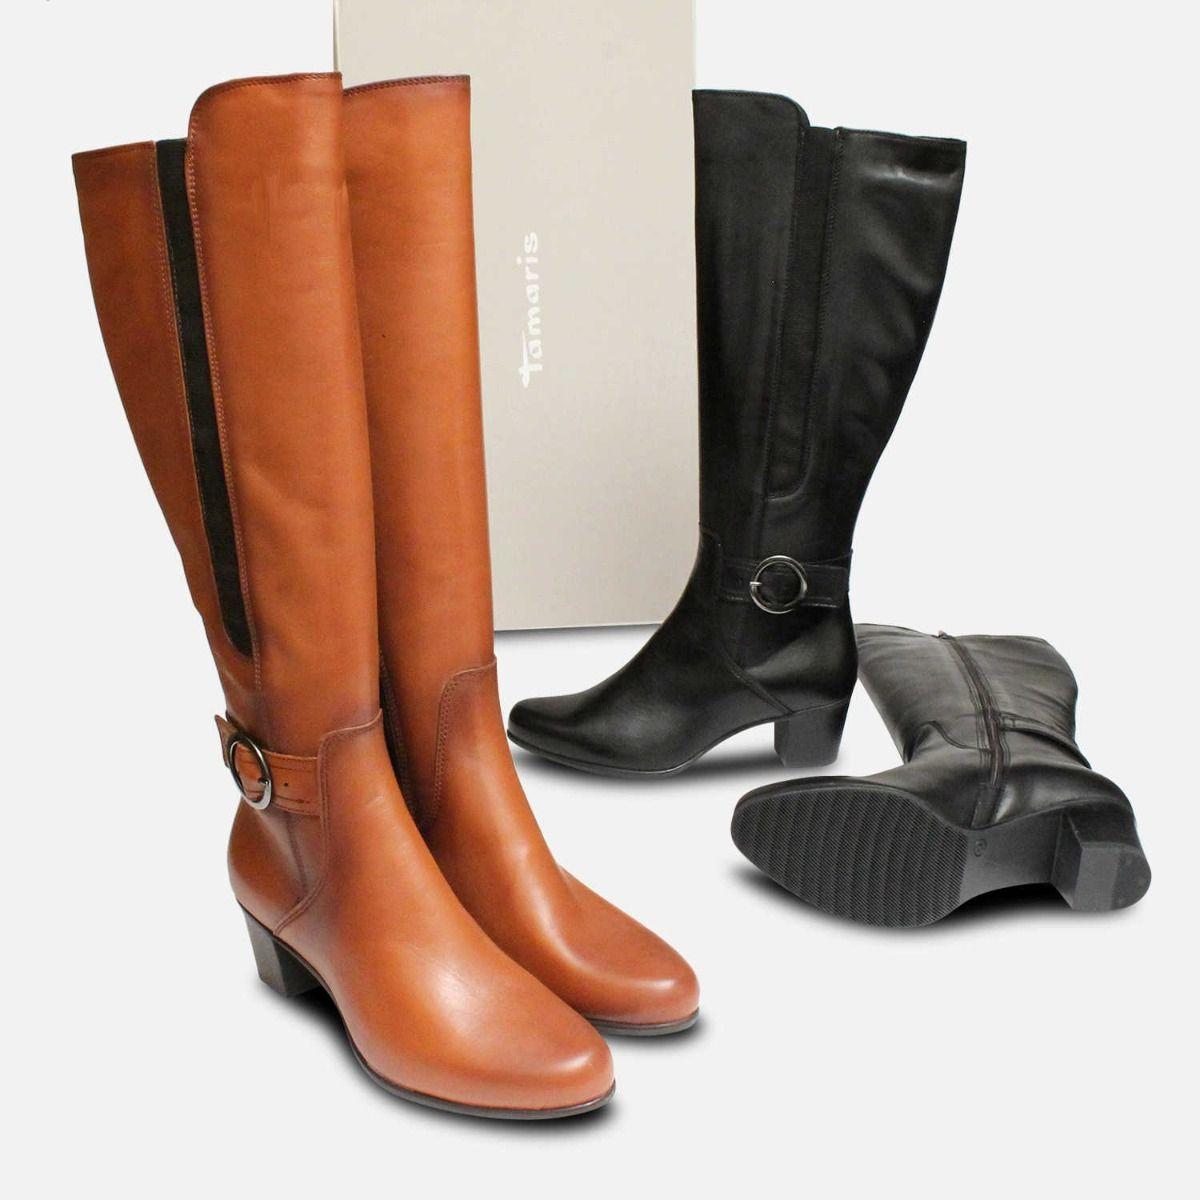 Tamaris Tan Brown Leather Knee High Boots with Heel